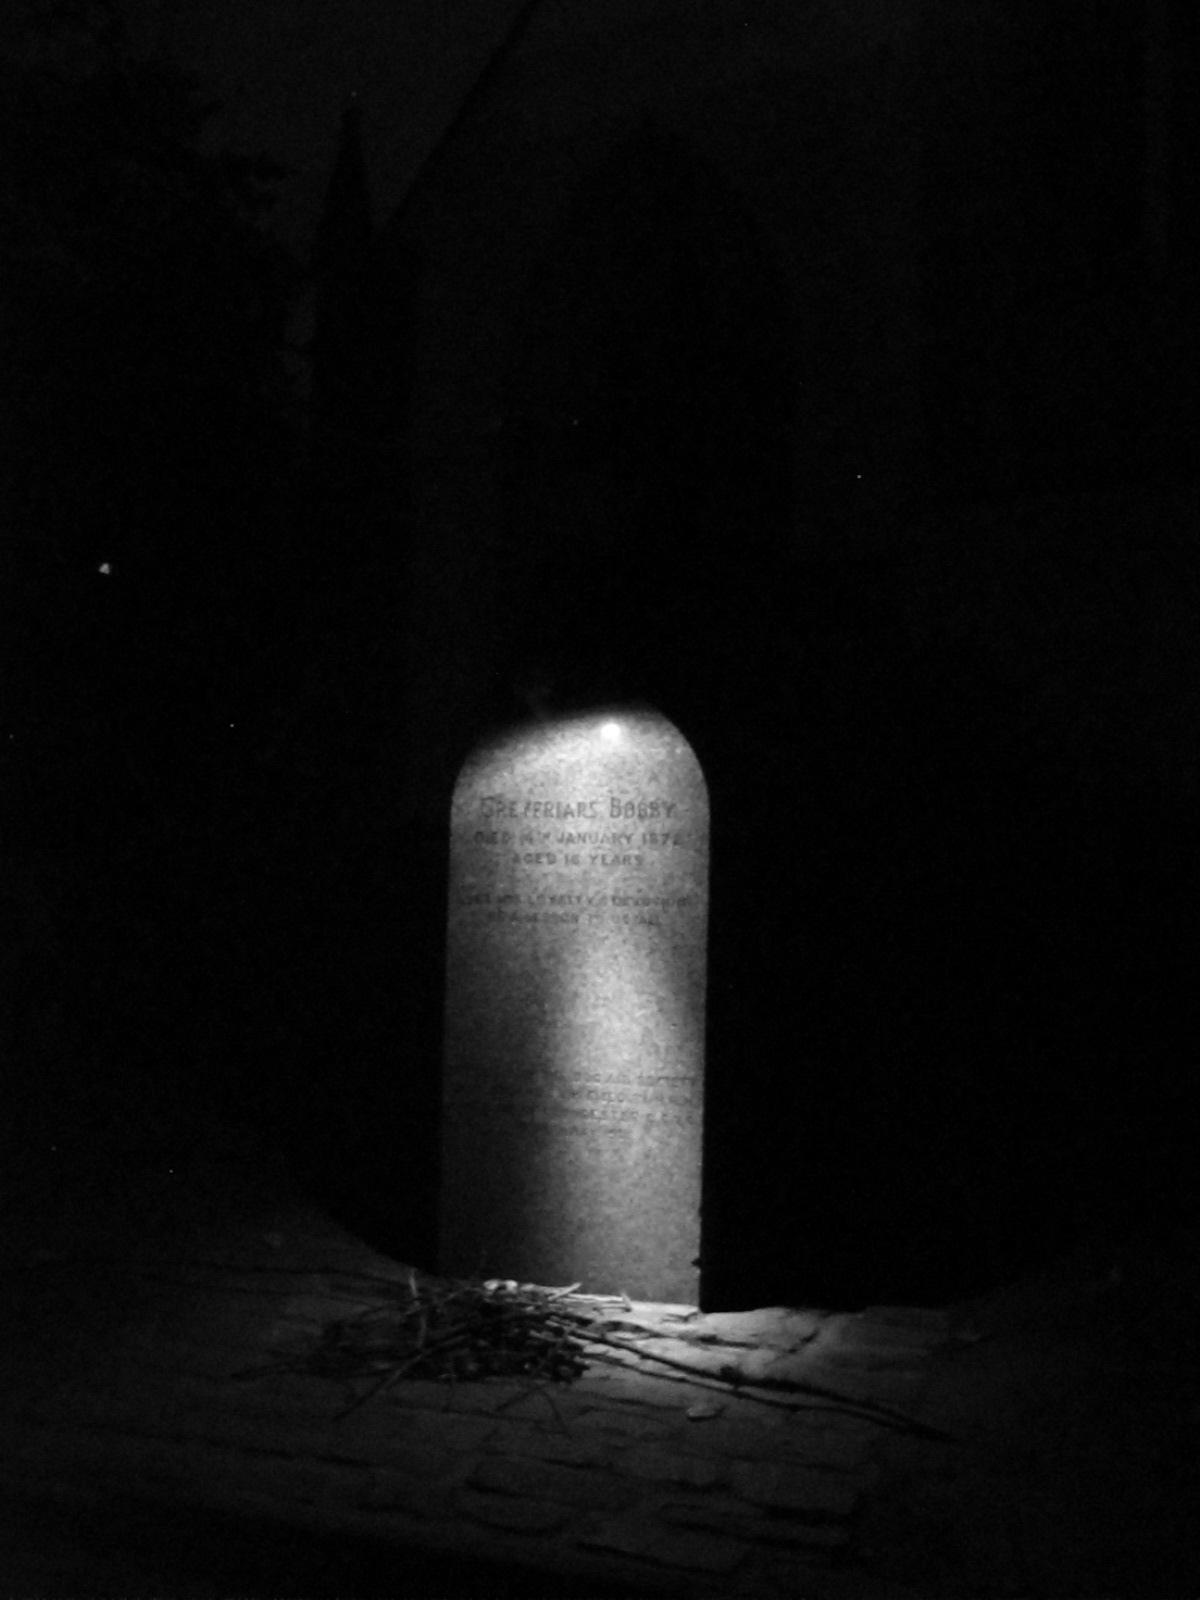 Greyfriars Bobby - grave of the dog, at night.